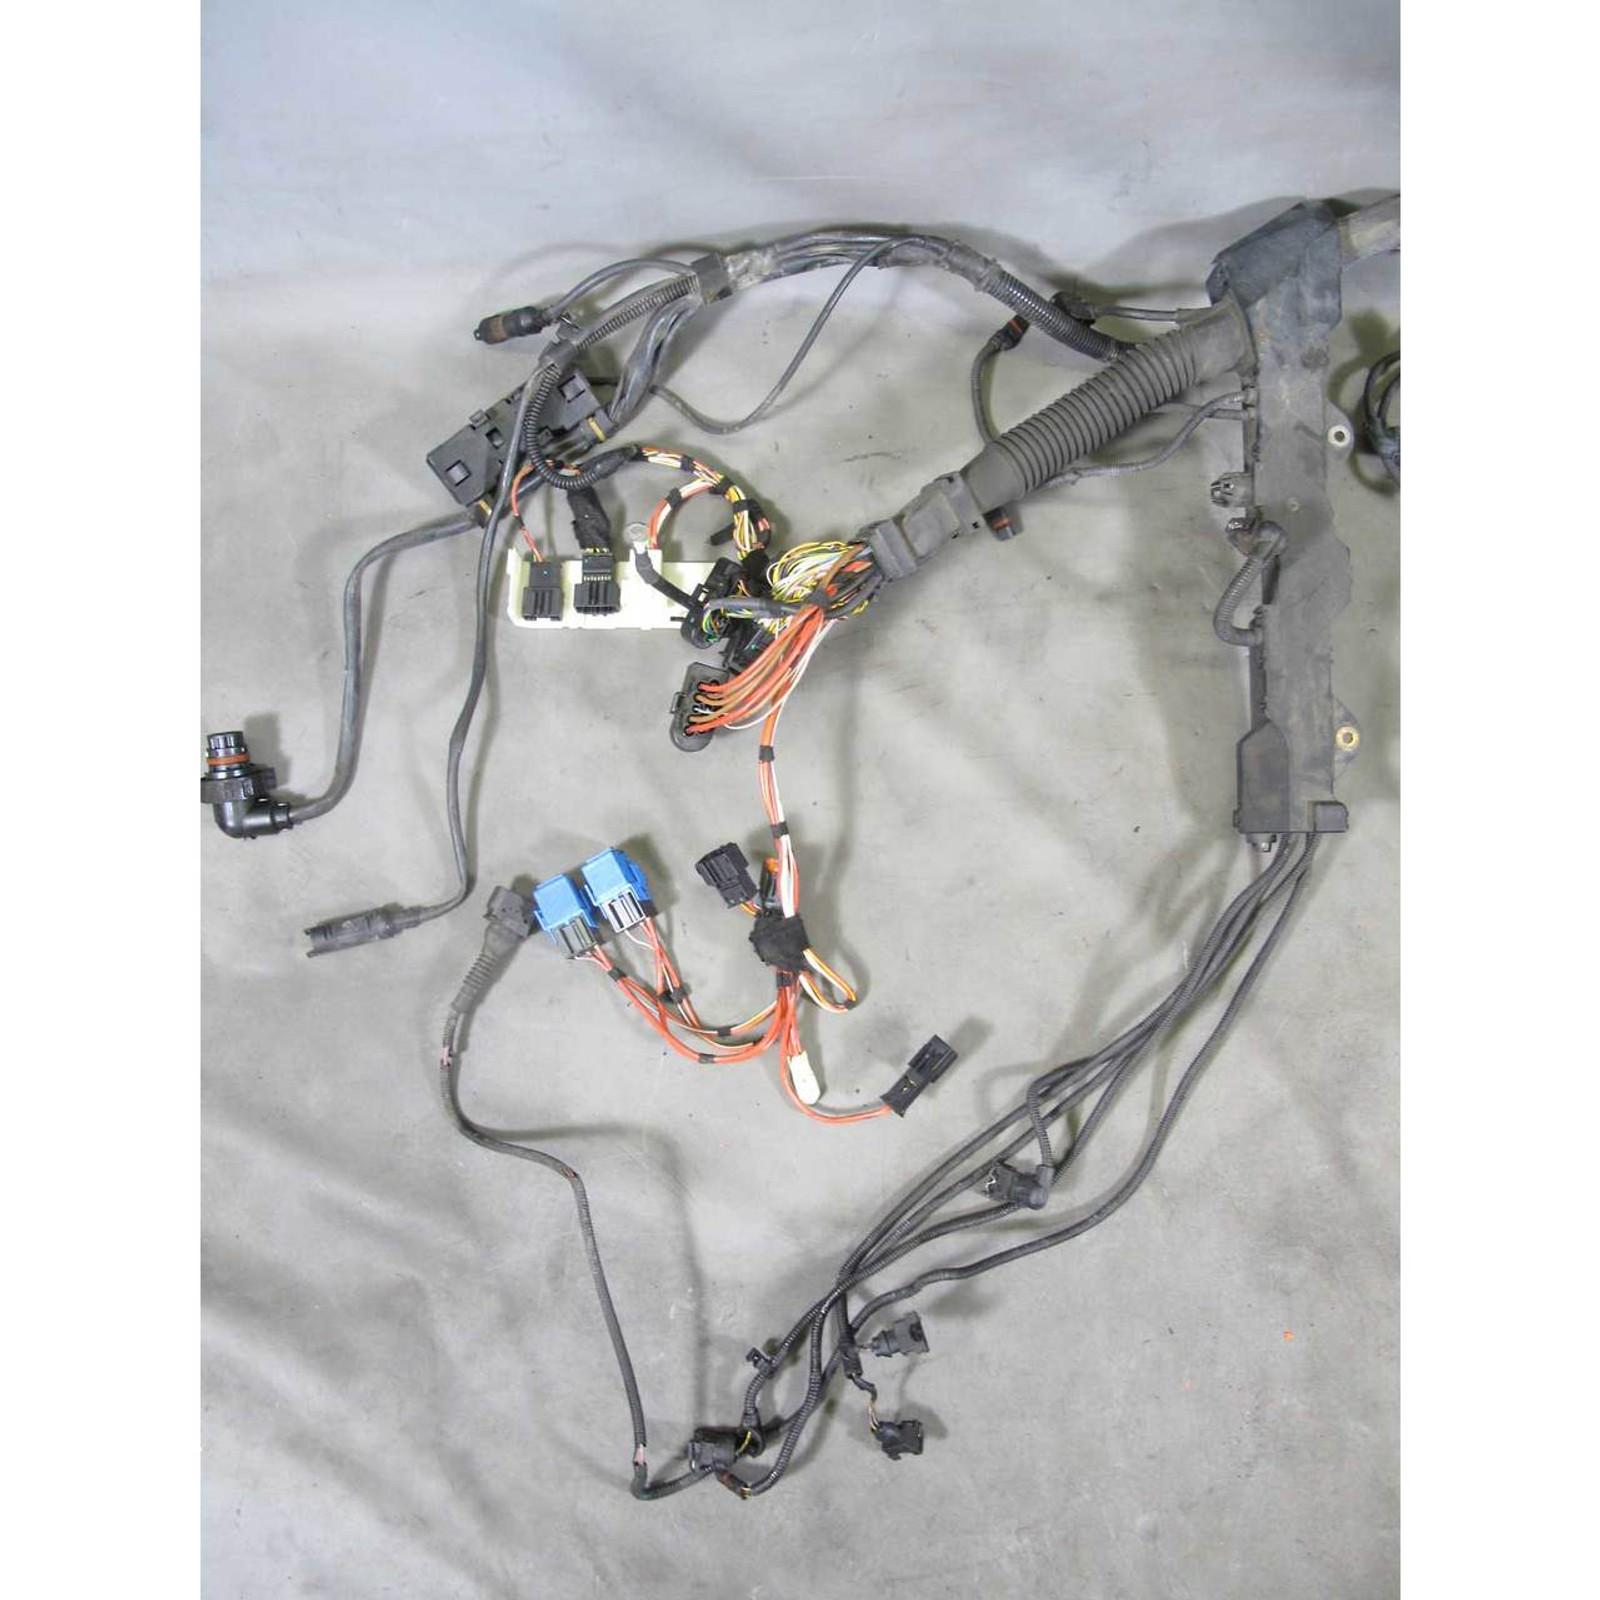 bmw x5 wiring harness 2007 2010 bmw e70 4 8i x5 4 8l n62tu engine wiring harness  x5 4 8l n62tu engine wiring harness